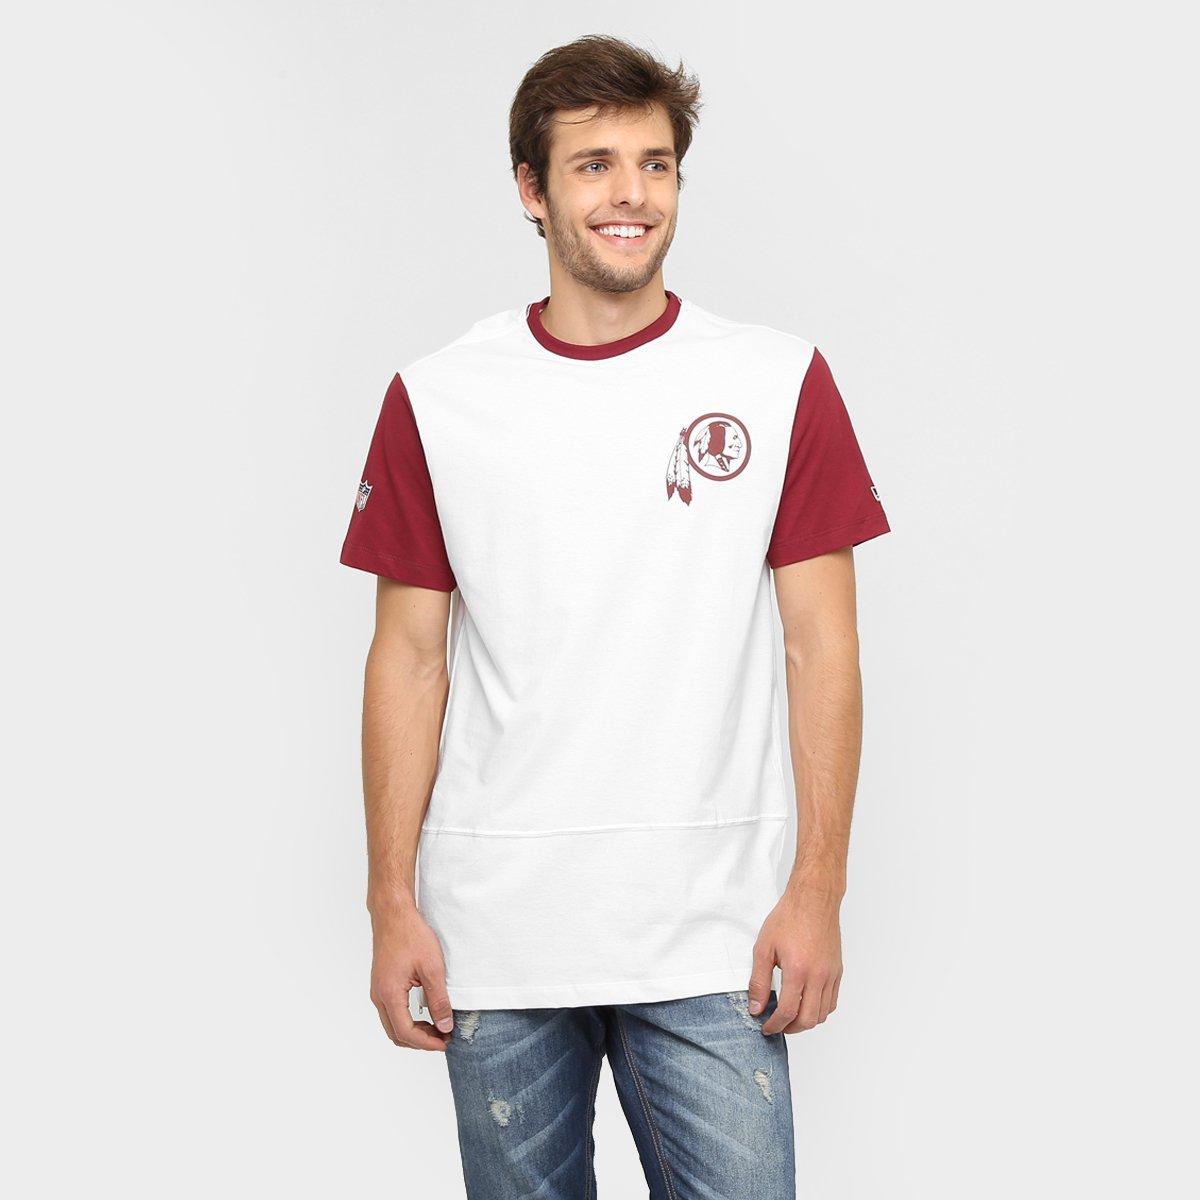 267853ea3f Camiseta New Era NFL Longname Washington Redskins - Compre Agora ...